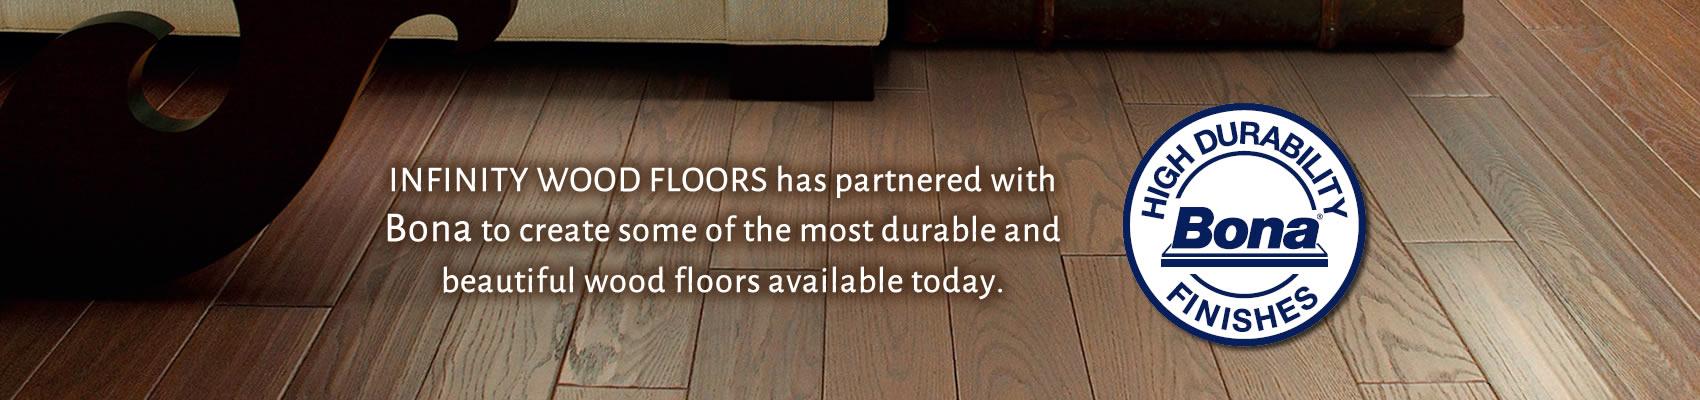 Precision Machined Wood Flooring Infinity Wood Floors